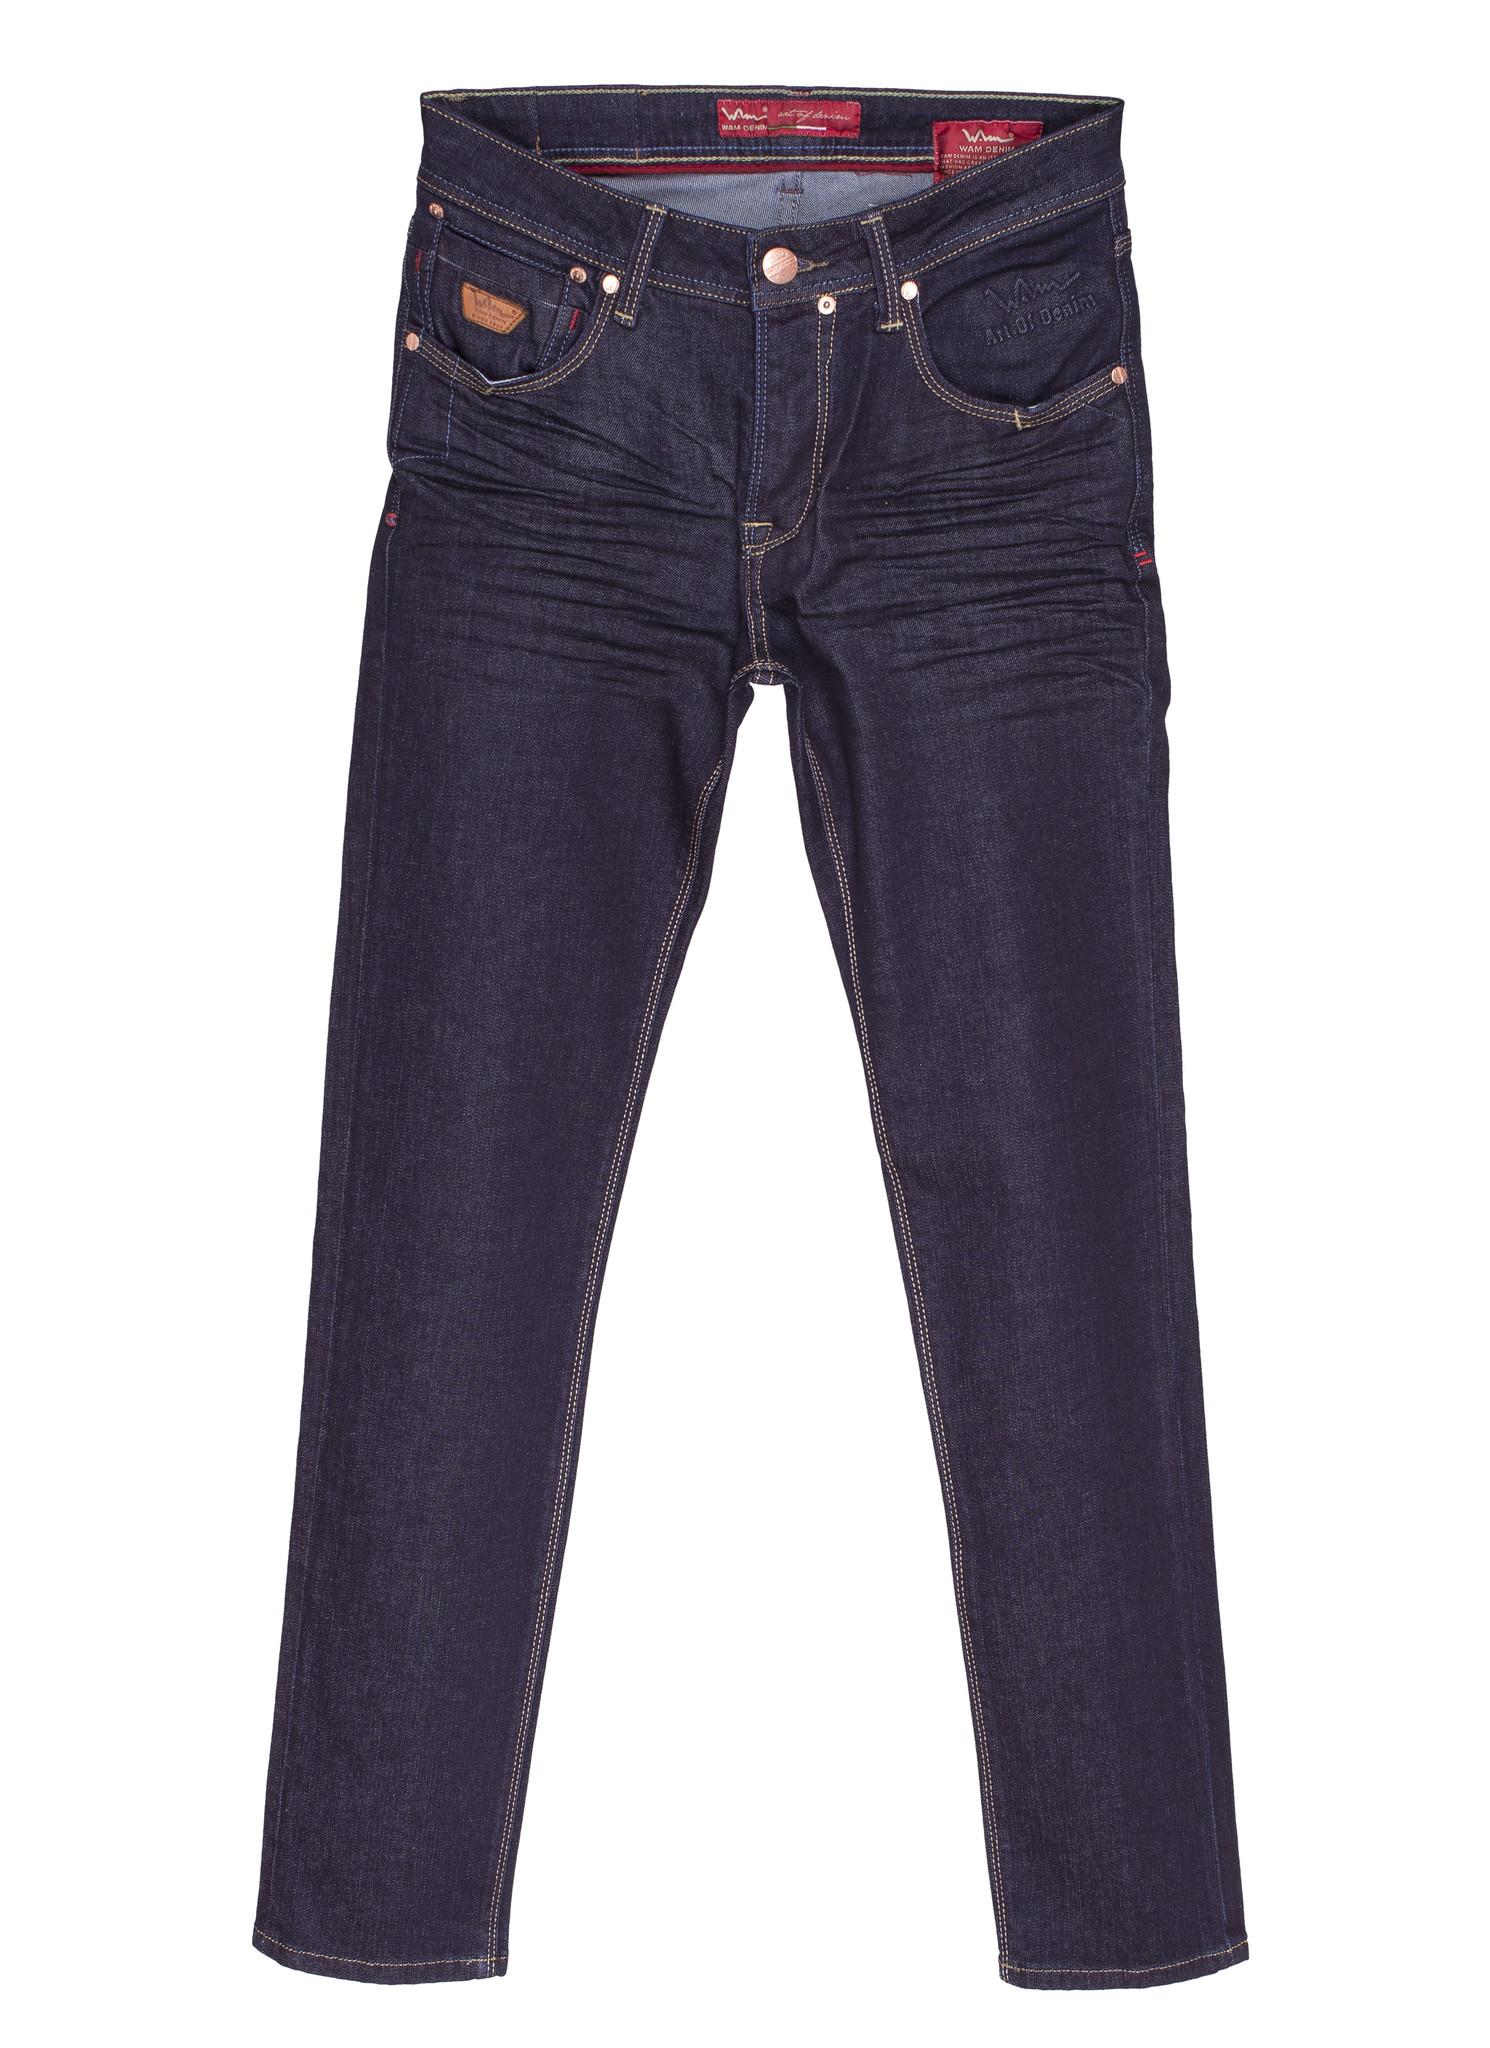 Wam Denim Jeans 92151 Dark Blue